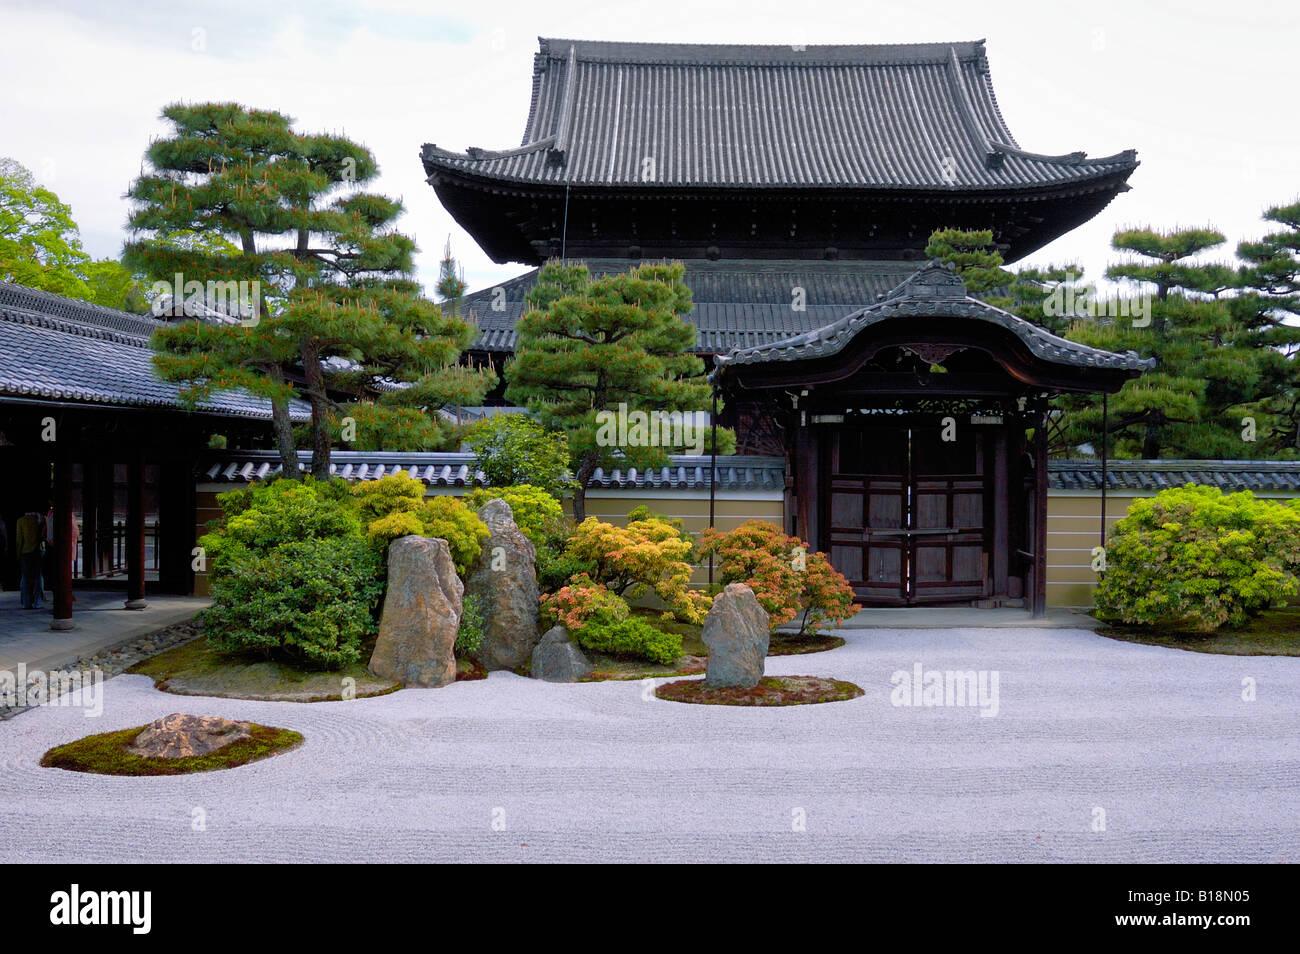 Sekitei Jardin De Pierre Dans Le Temple Ryoanji Japon Kyoto Banque D